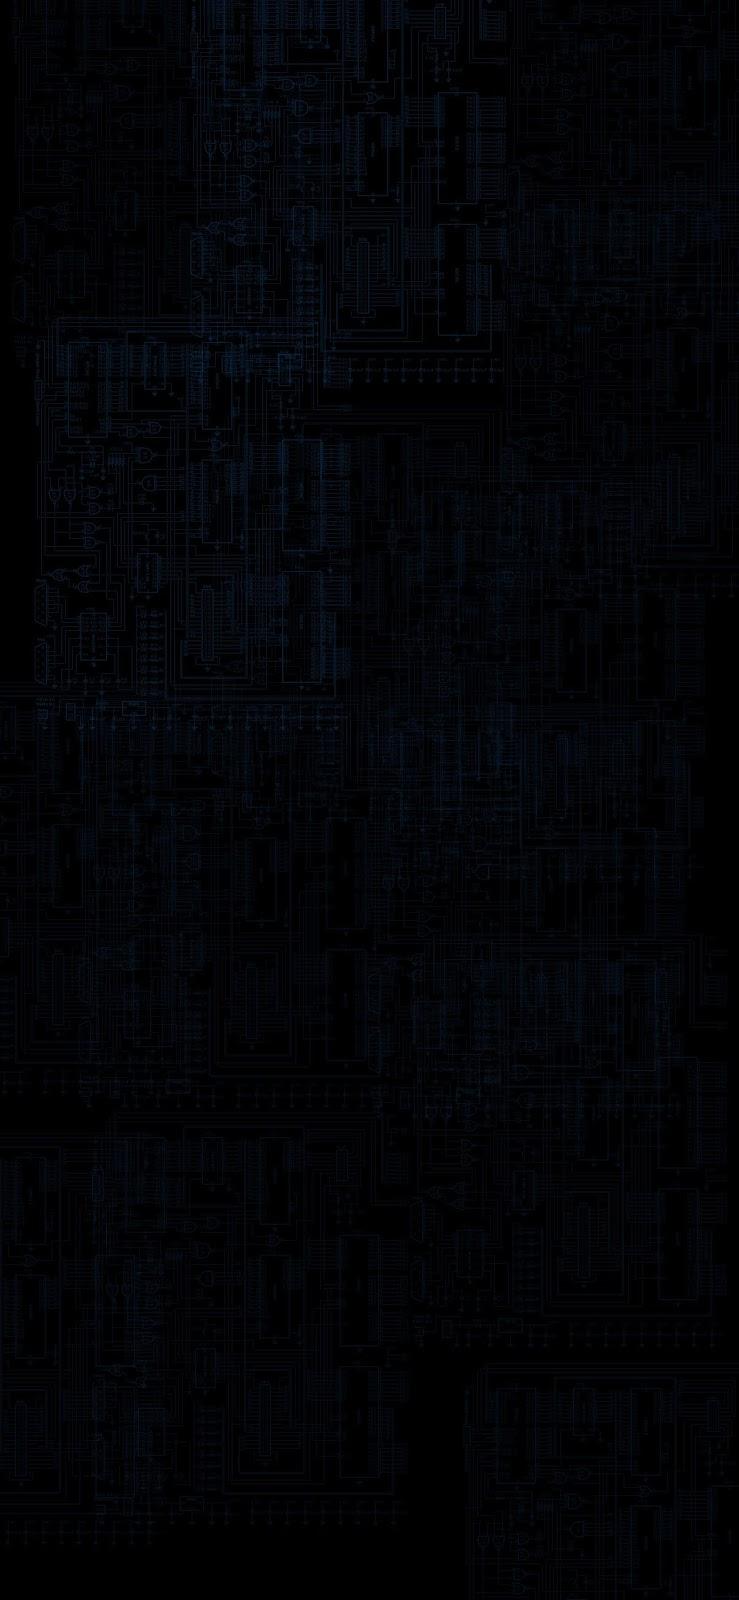 4k Tech Wallpapers